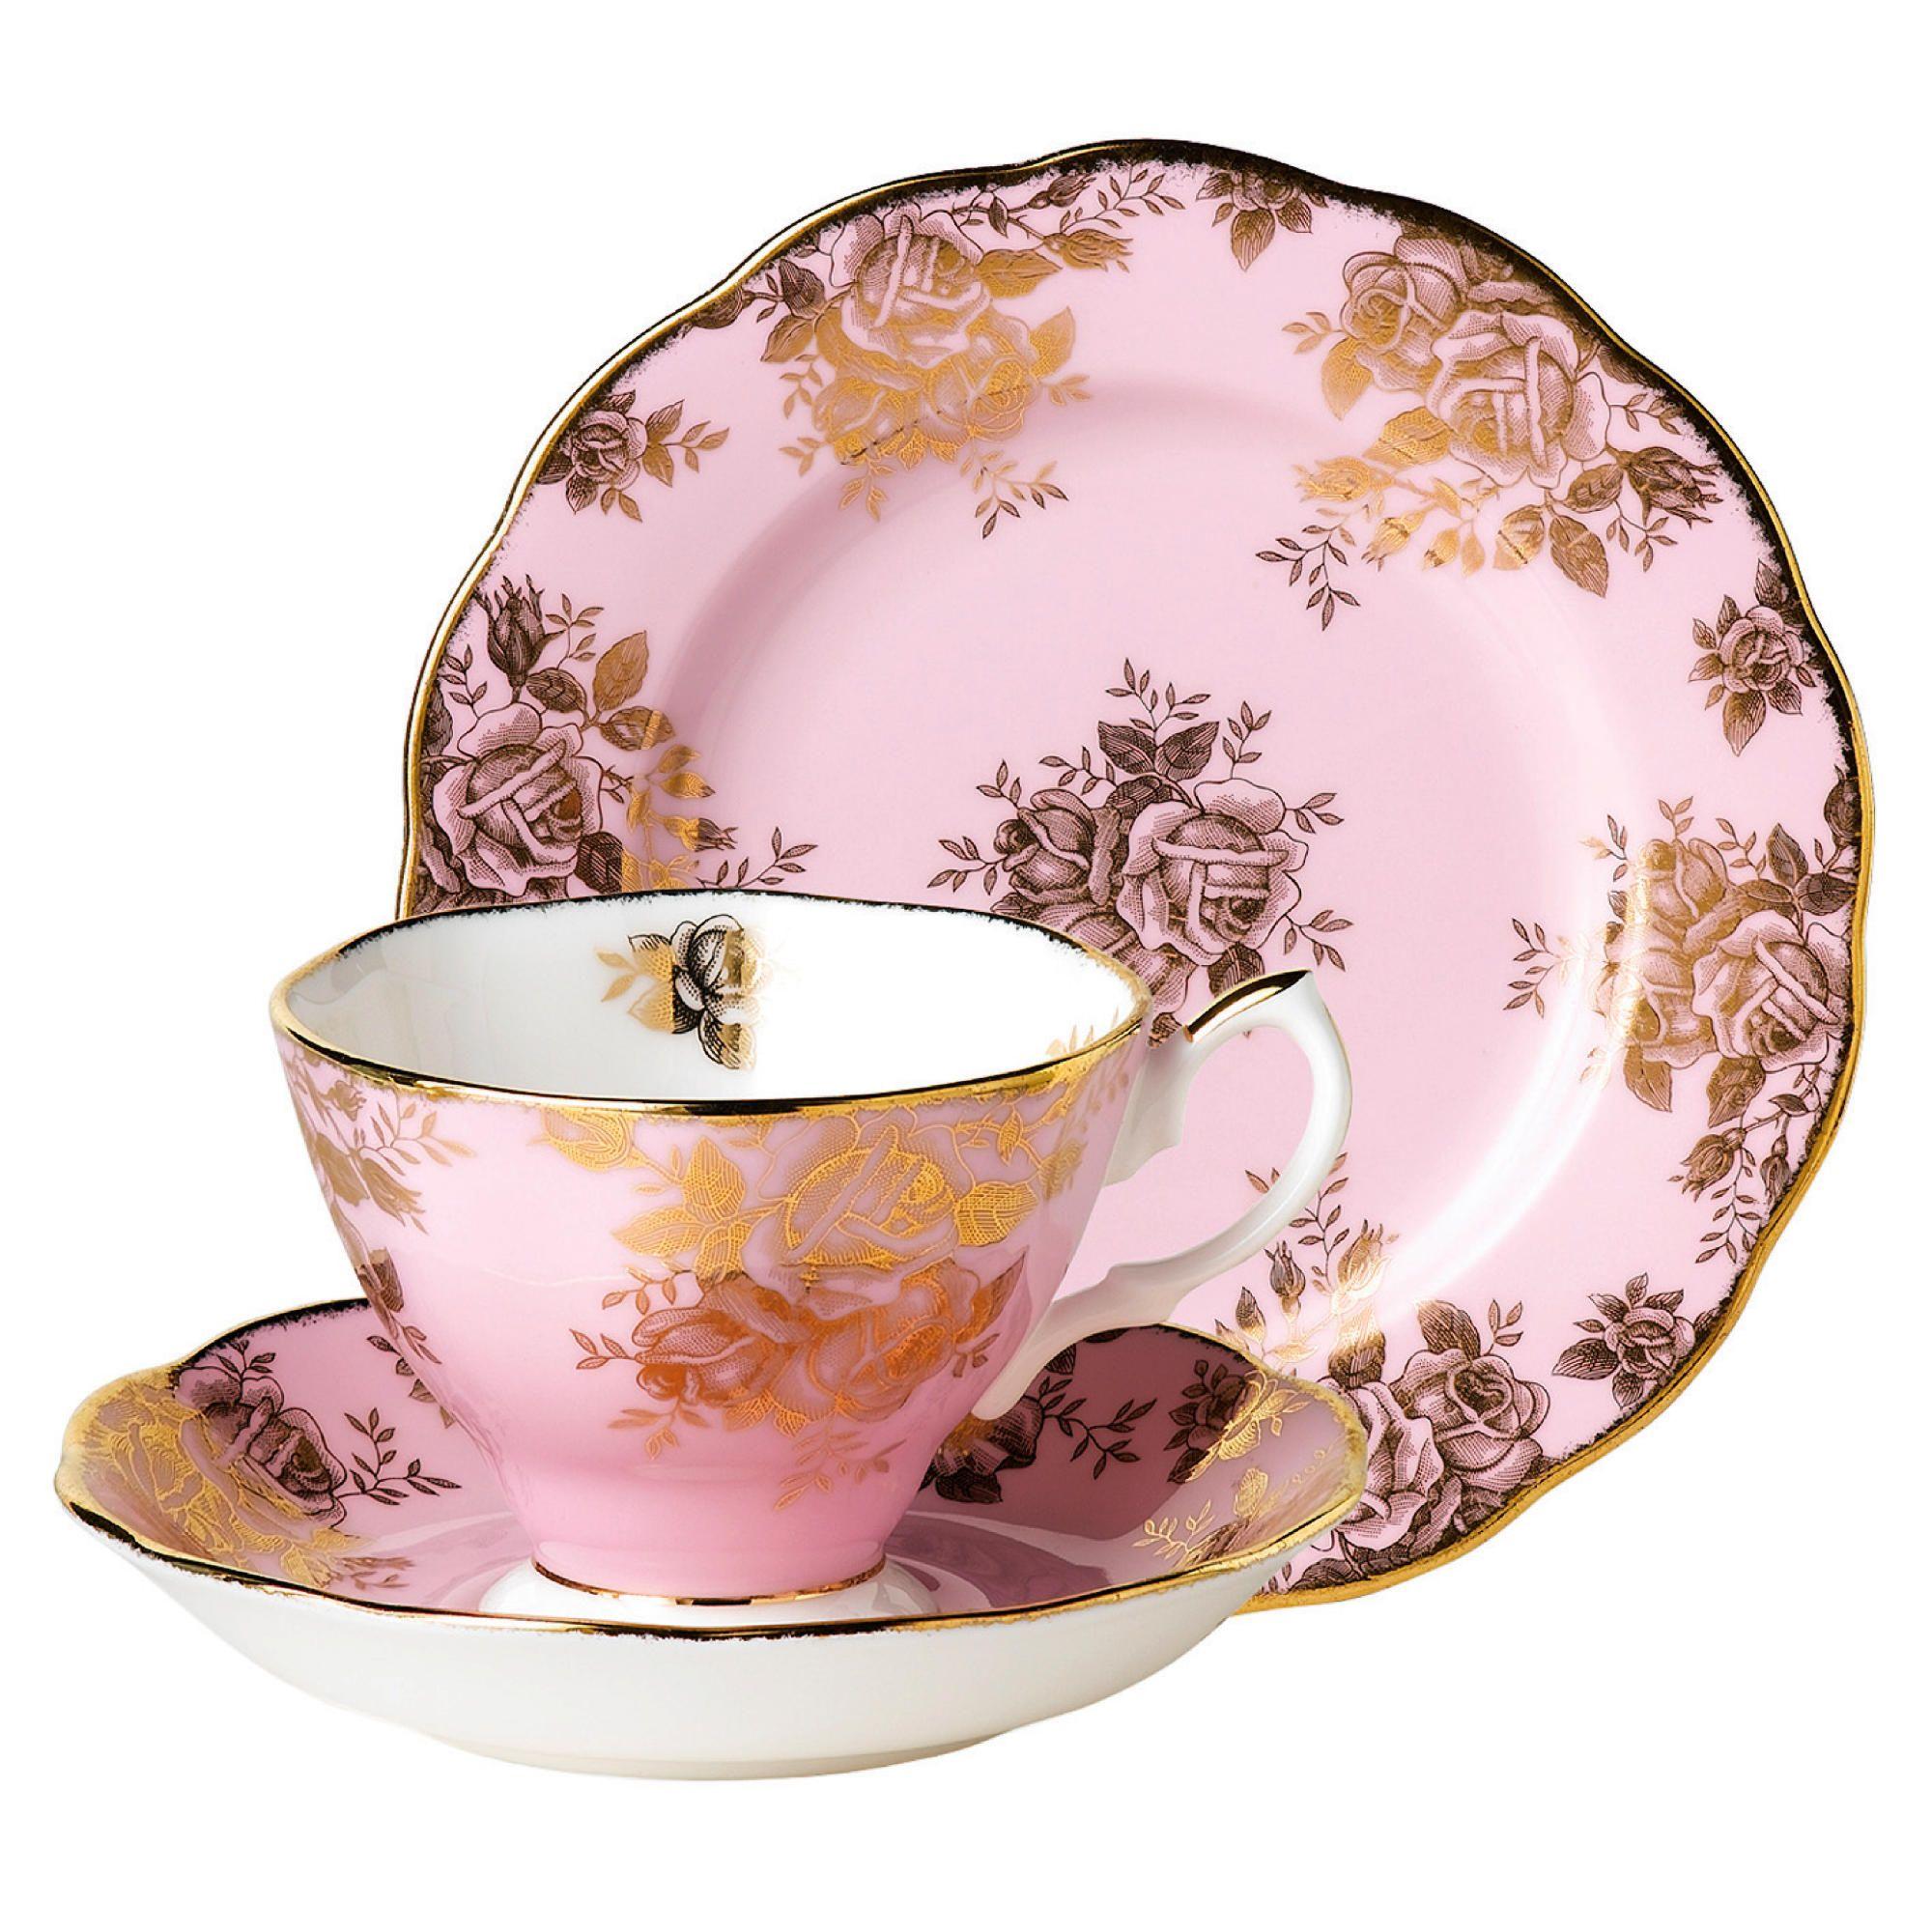 Royal Albert 1960 Golden Rose Tea Set